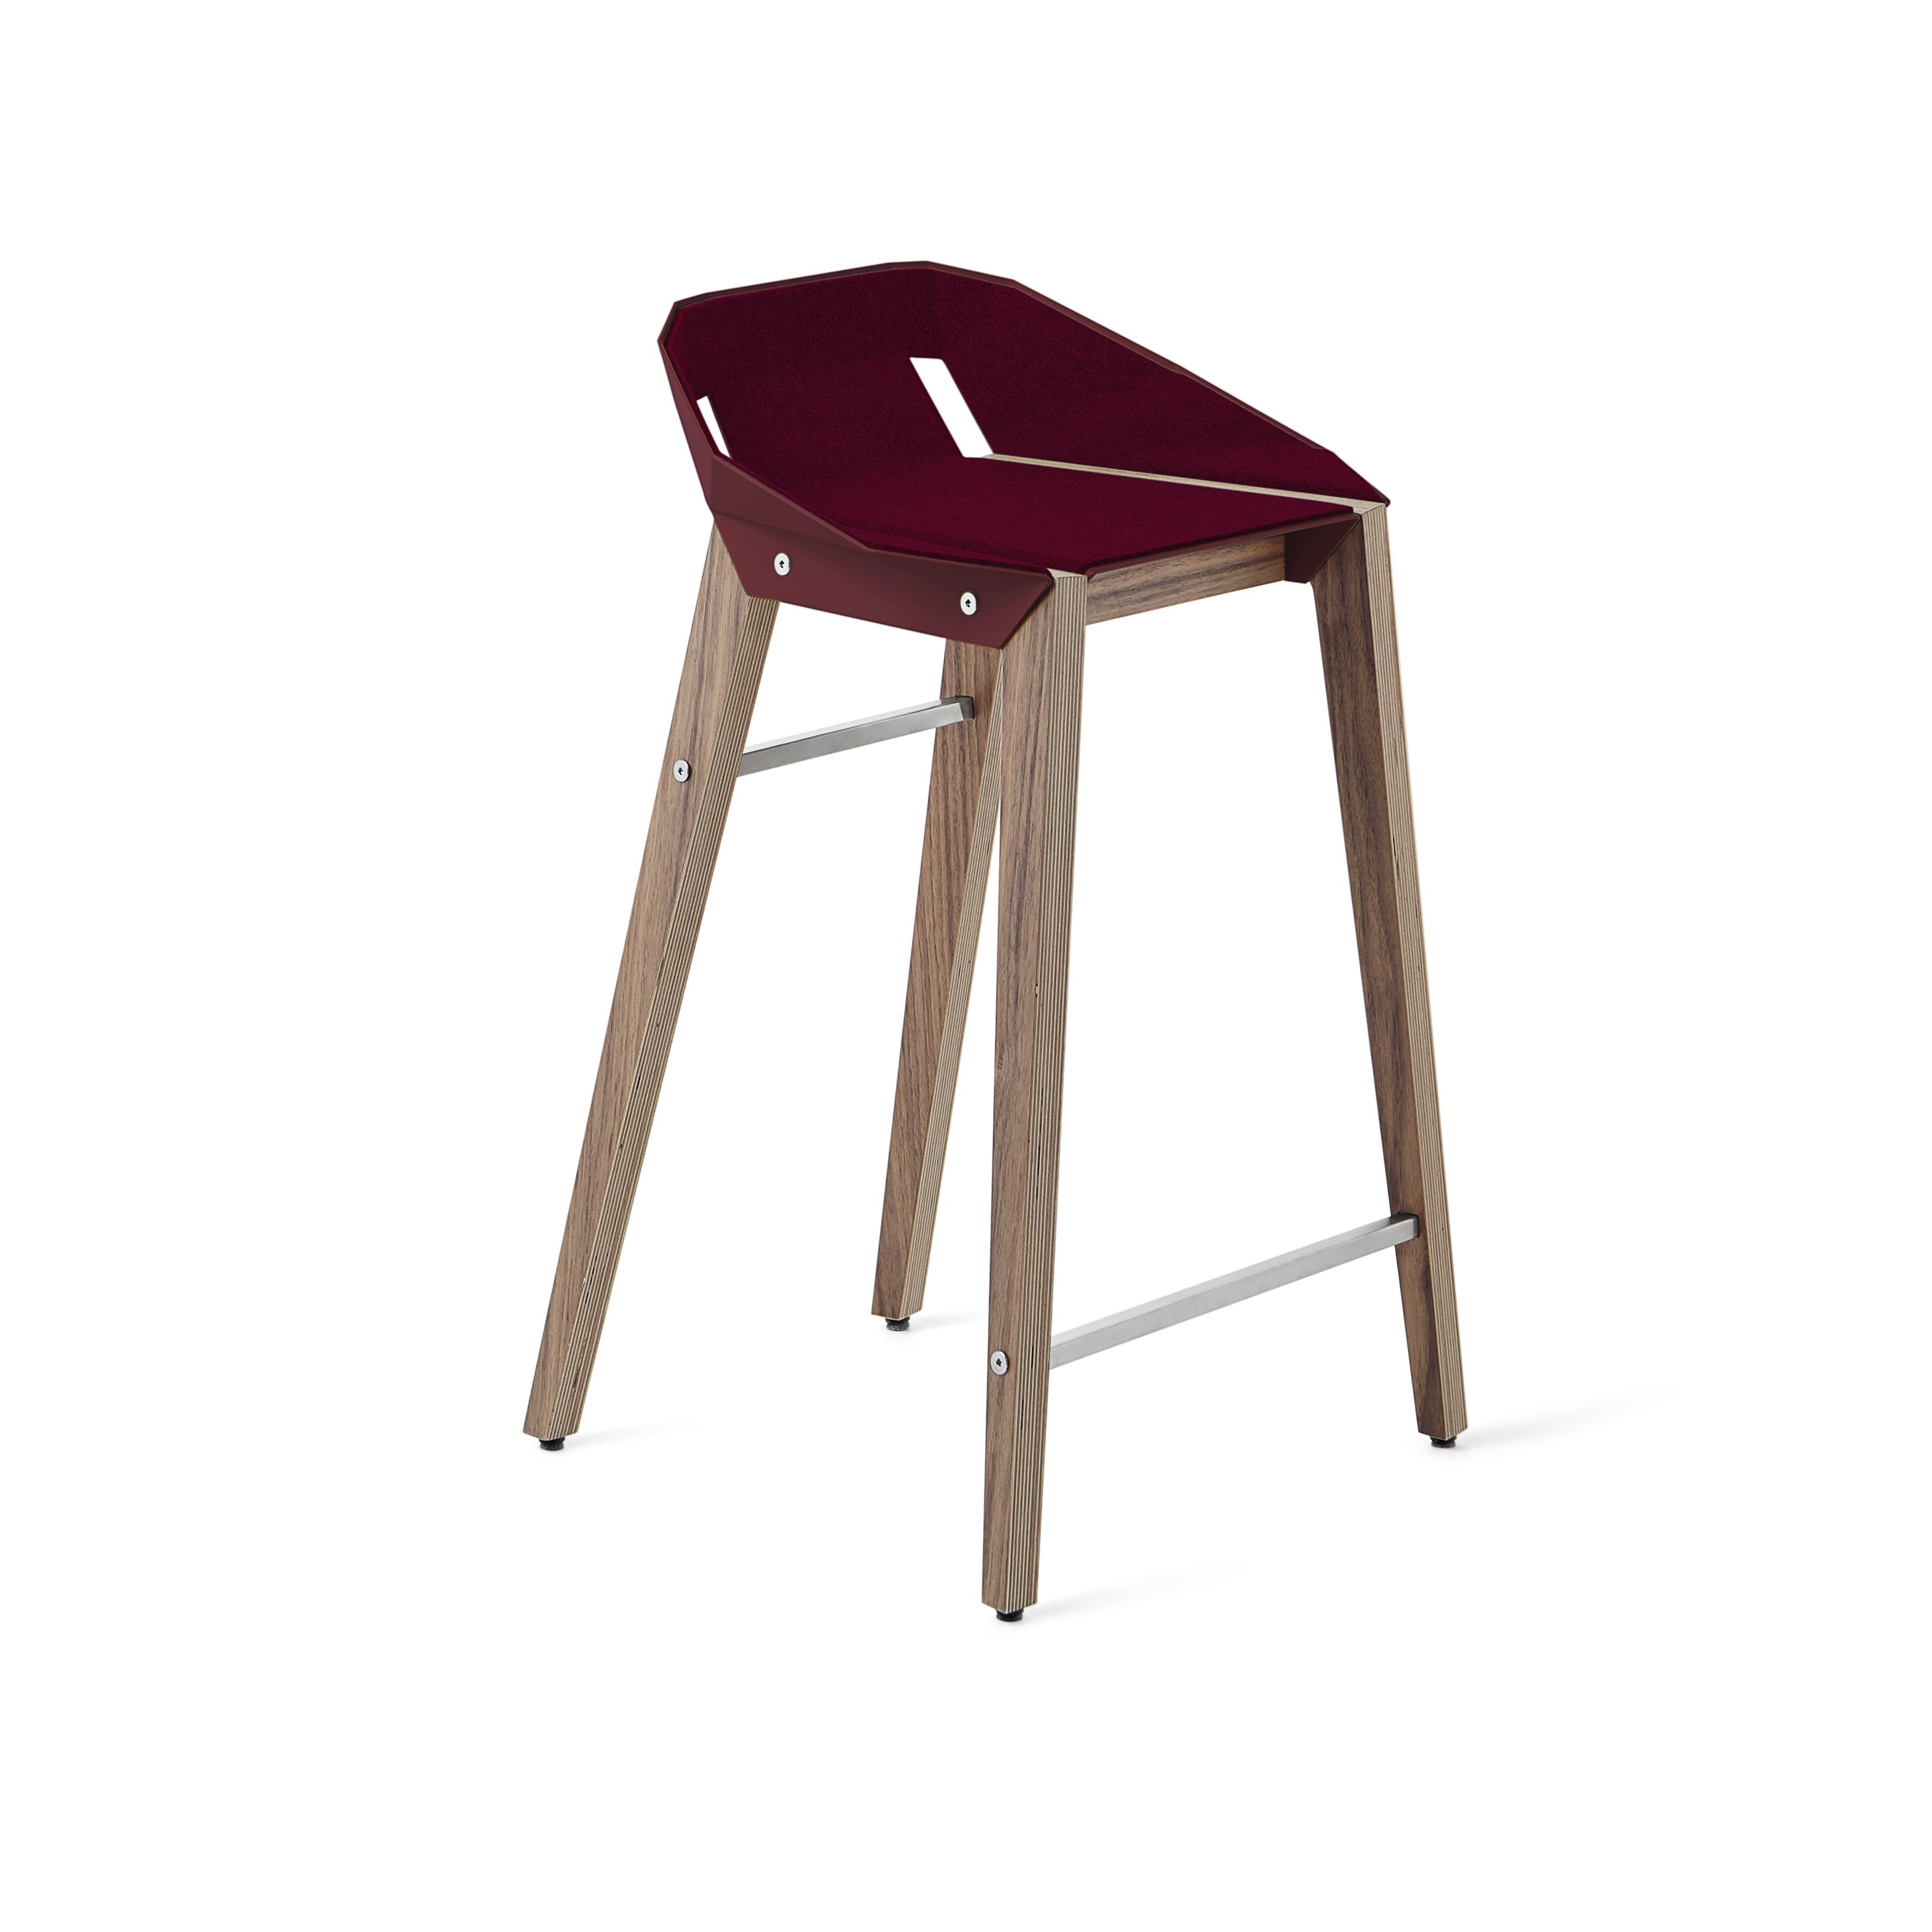 stools, interior-design, furniture, FELT DIAGO KITCHEN STOOL WALNUT - hoker diago felt 62 walnut RAL 3005 fs